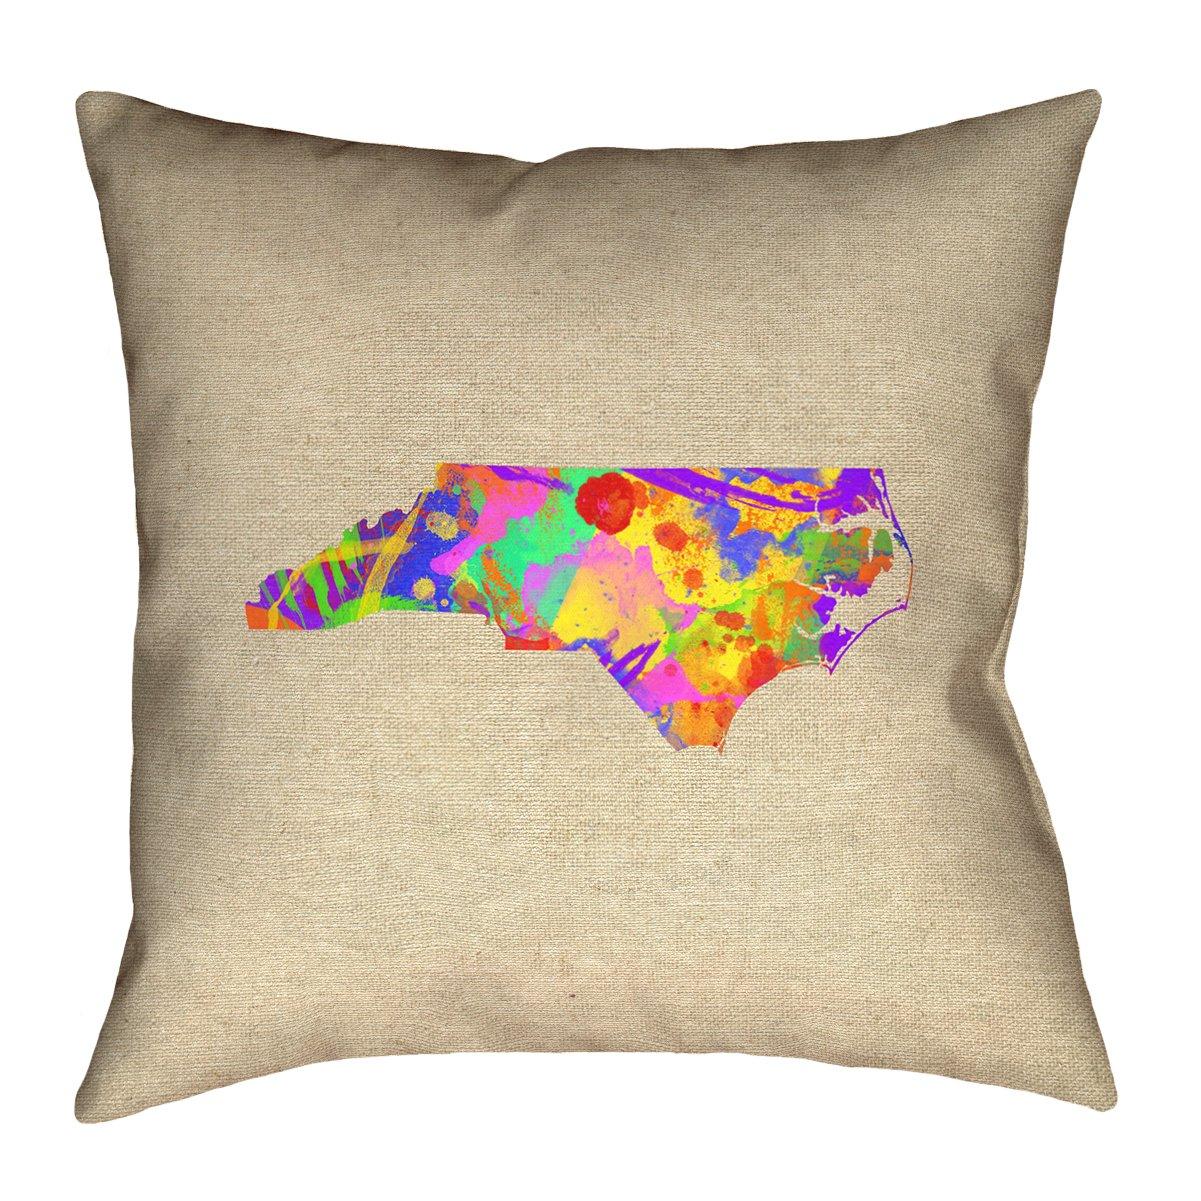 ArtVerse Katelyn Smith North Carolina Love Watercolor Pillow by ArtVerse (Image #1)